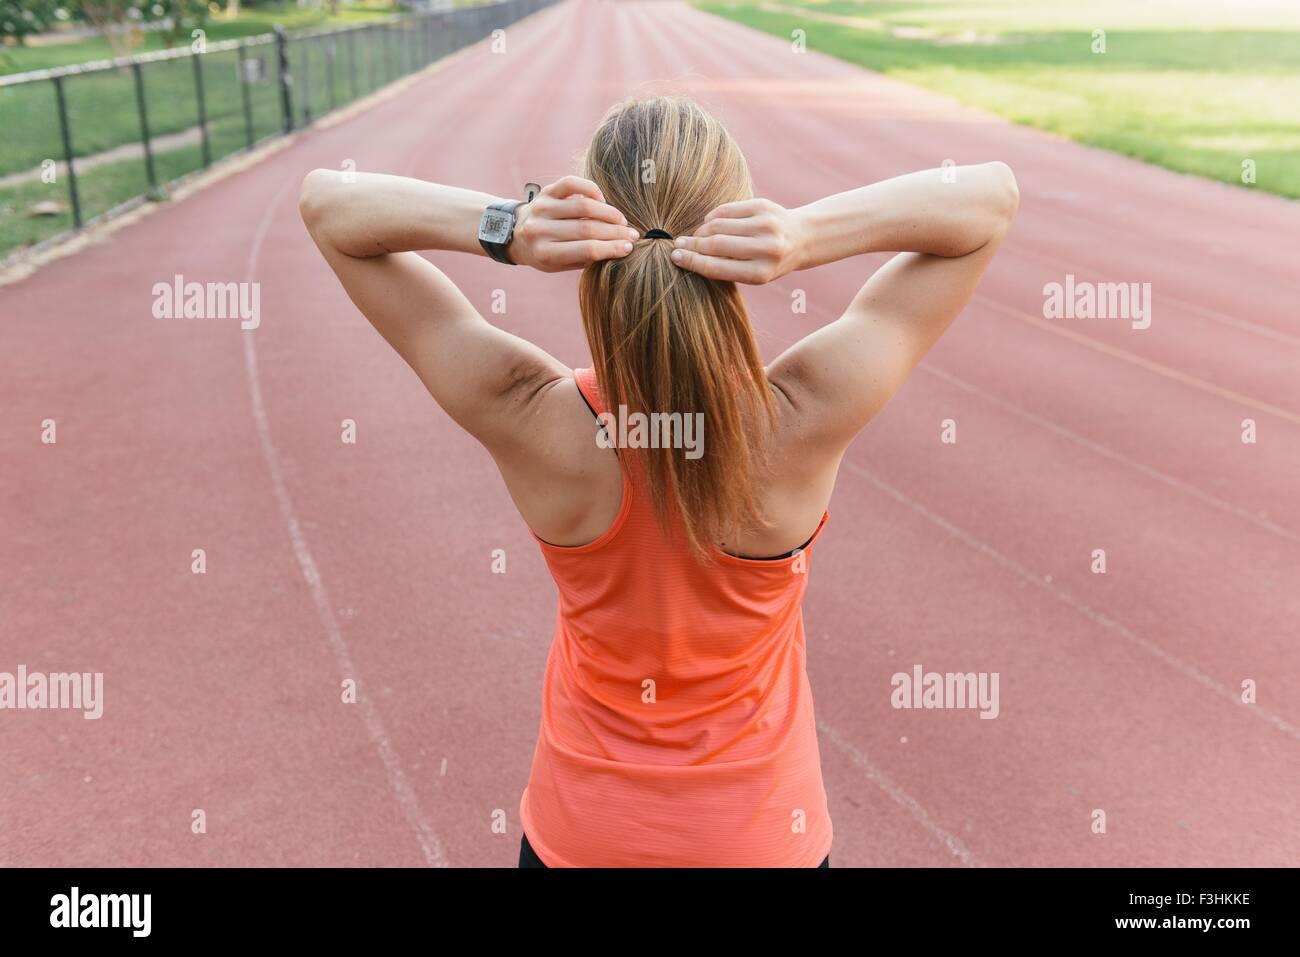 Junge Frau am Sportplatz, Rückansicht Ausführung vorbereitet Stockbild